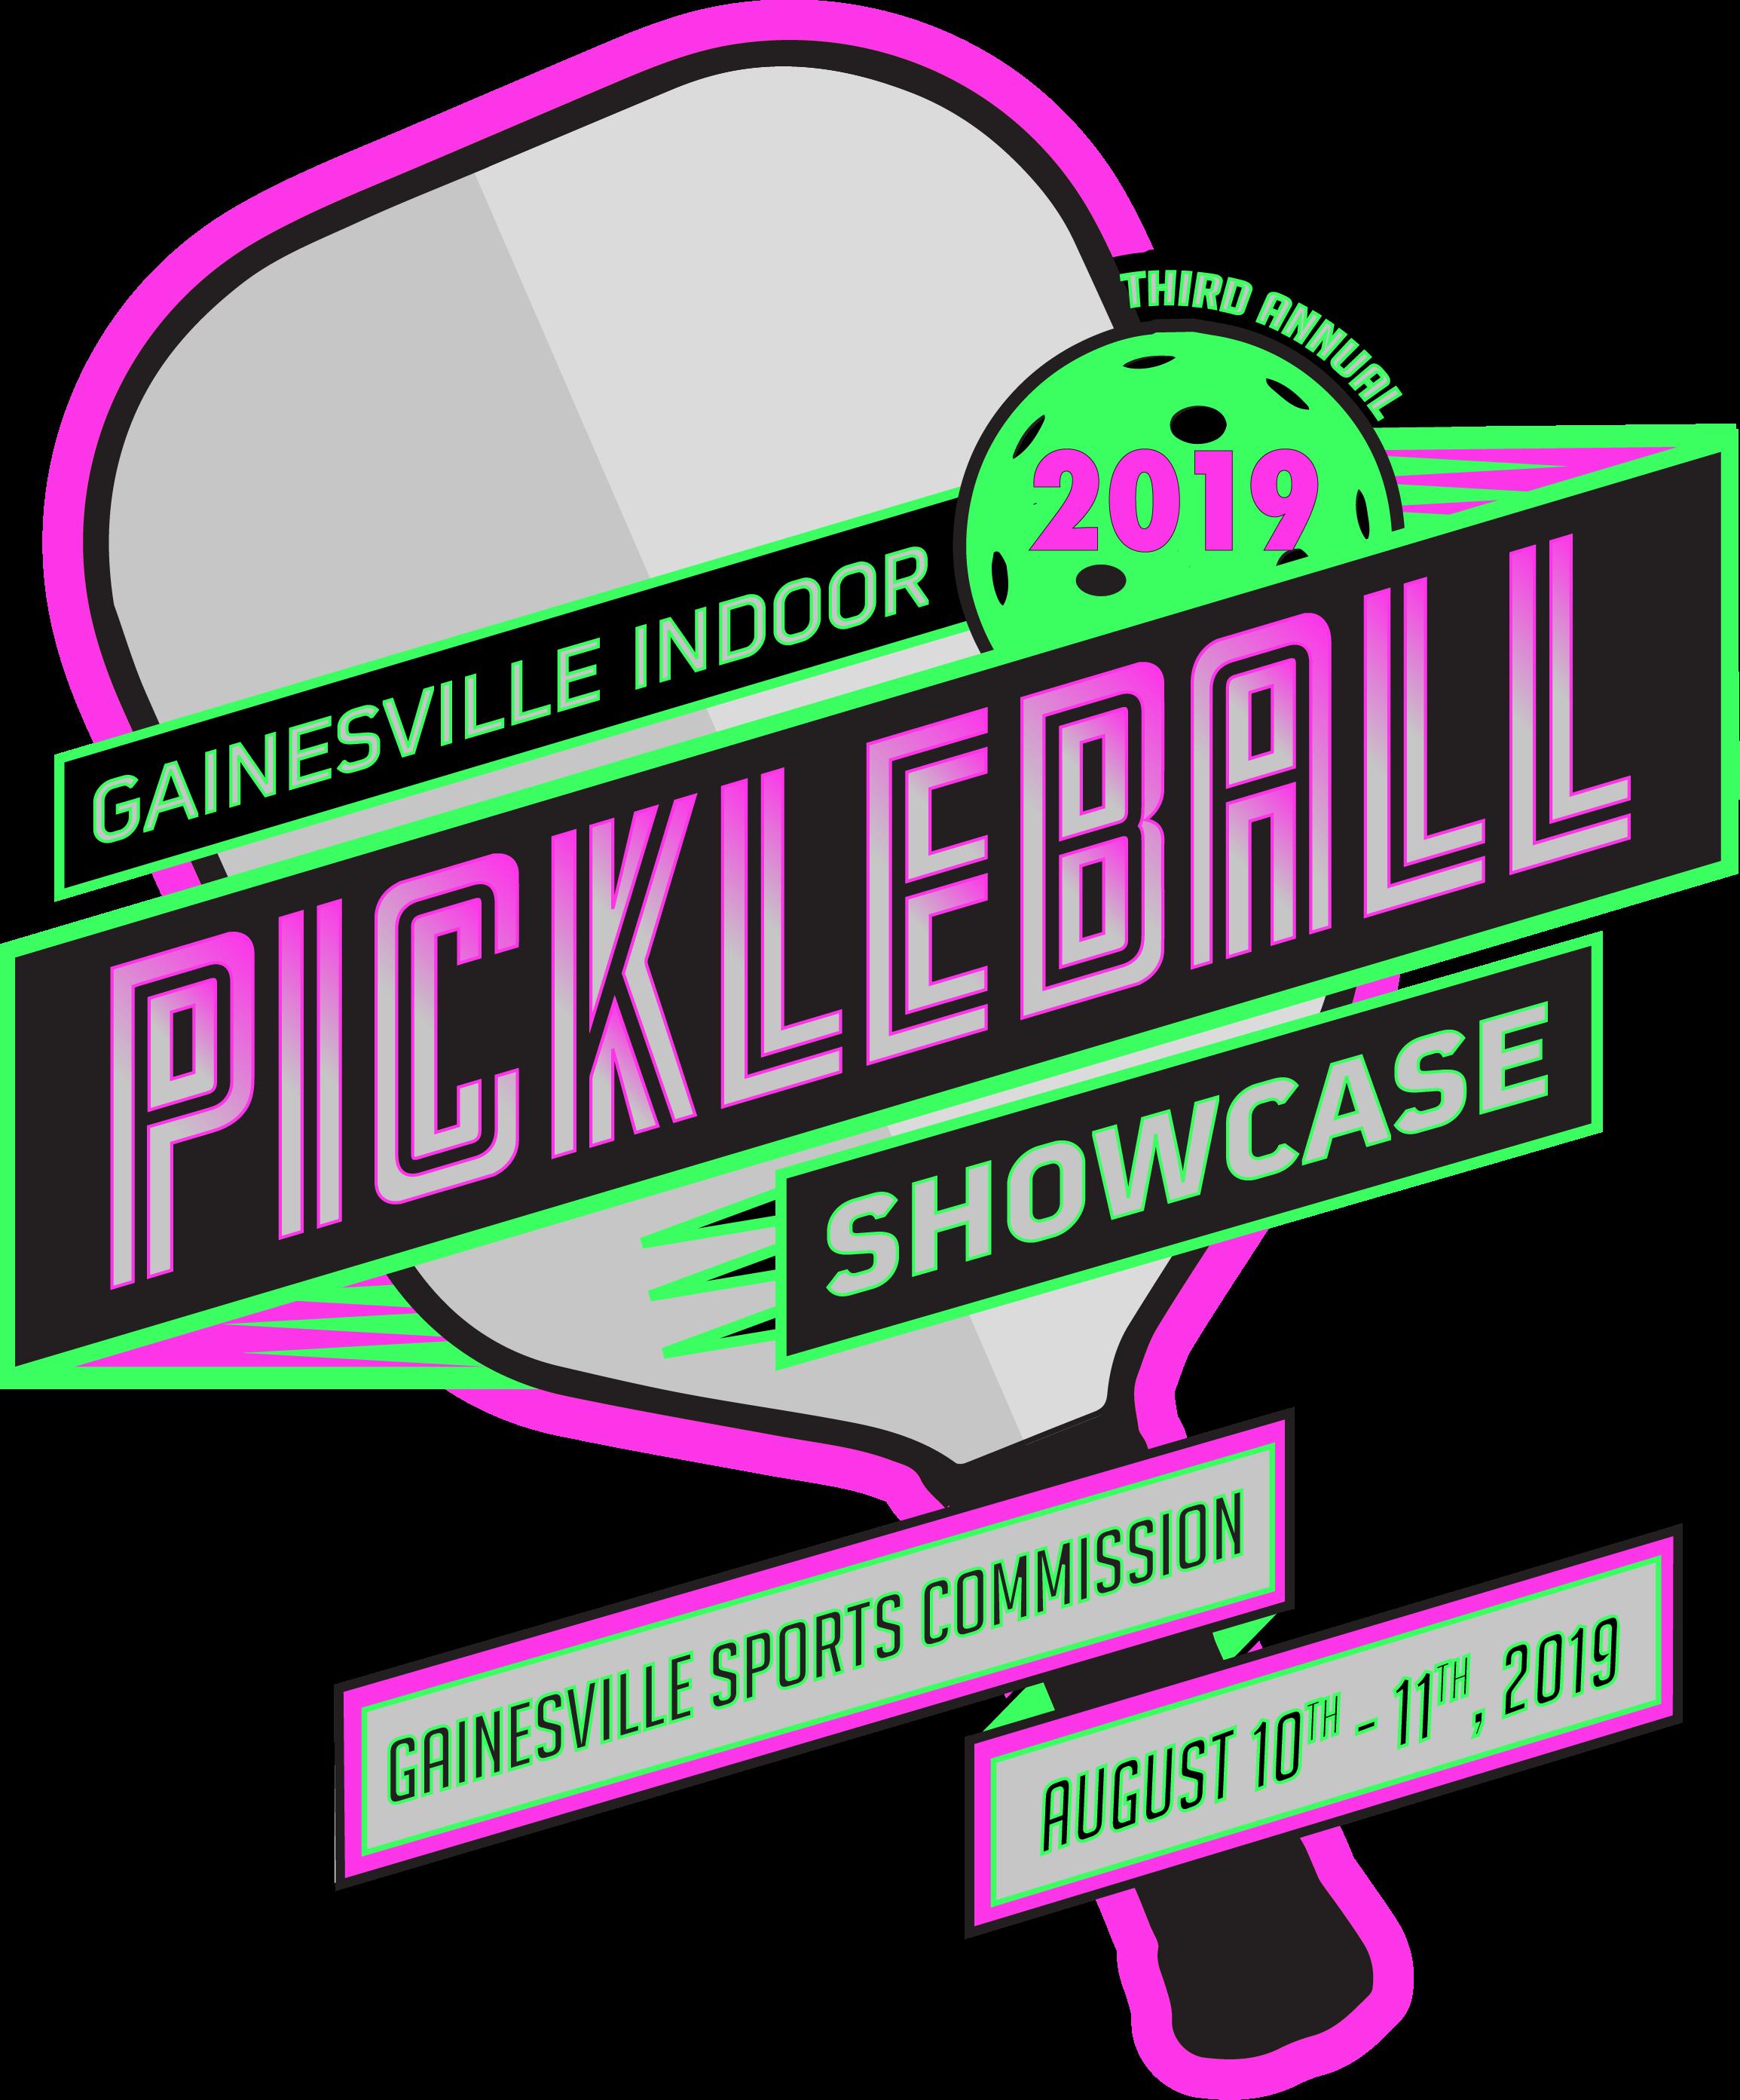 3rd Annual Gainesville Indoor Pickleball Showcase